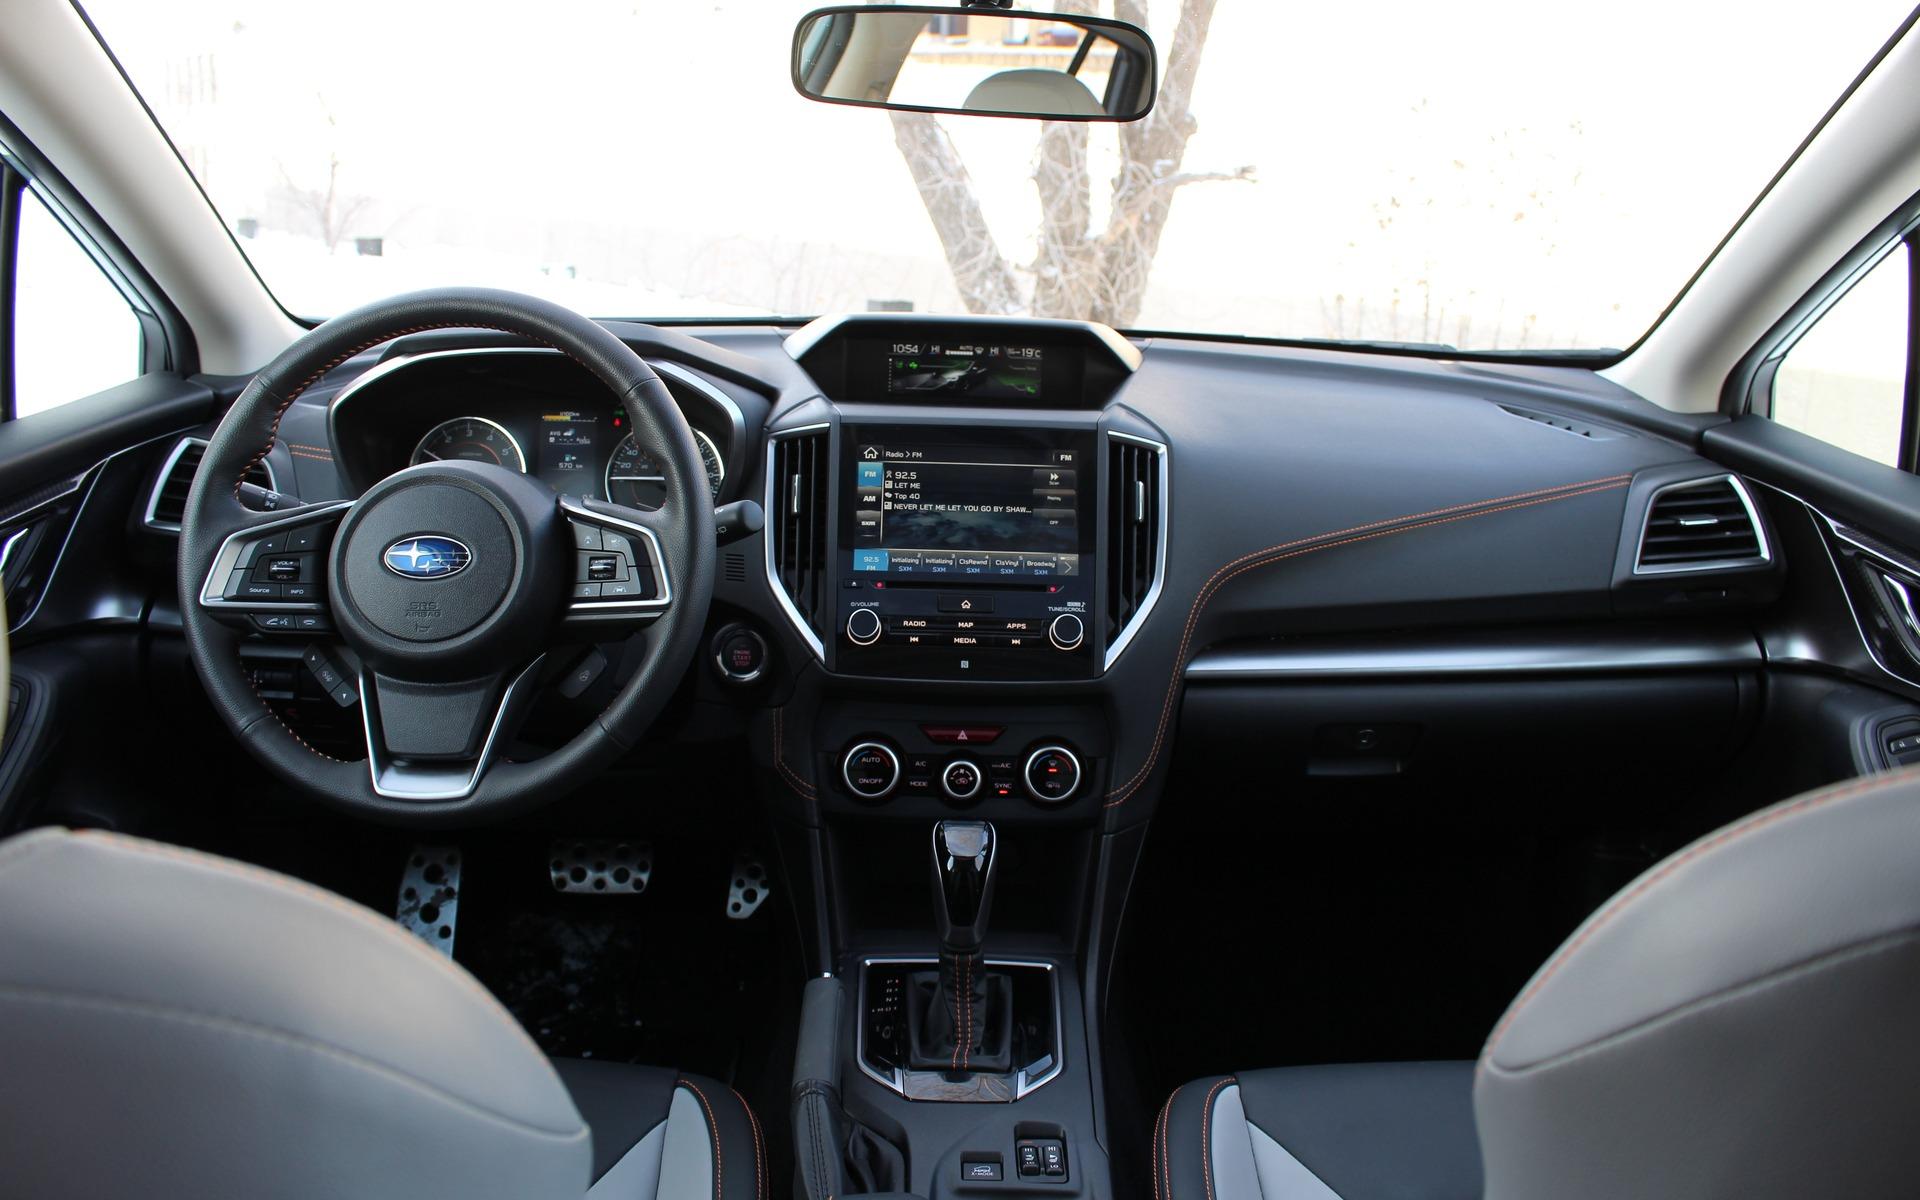 Subaru Crosstrek 2019 : à la mode 343903_2018_Subaru_Crosstrek